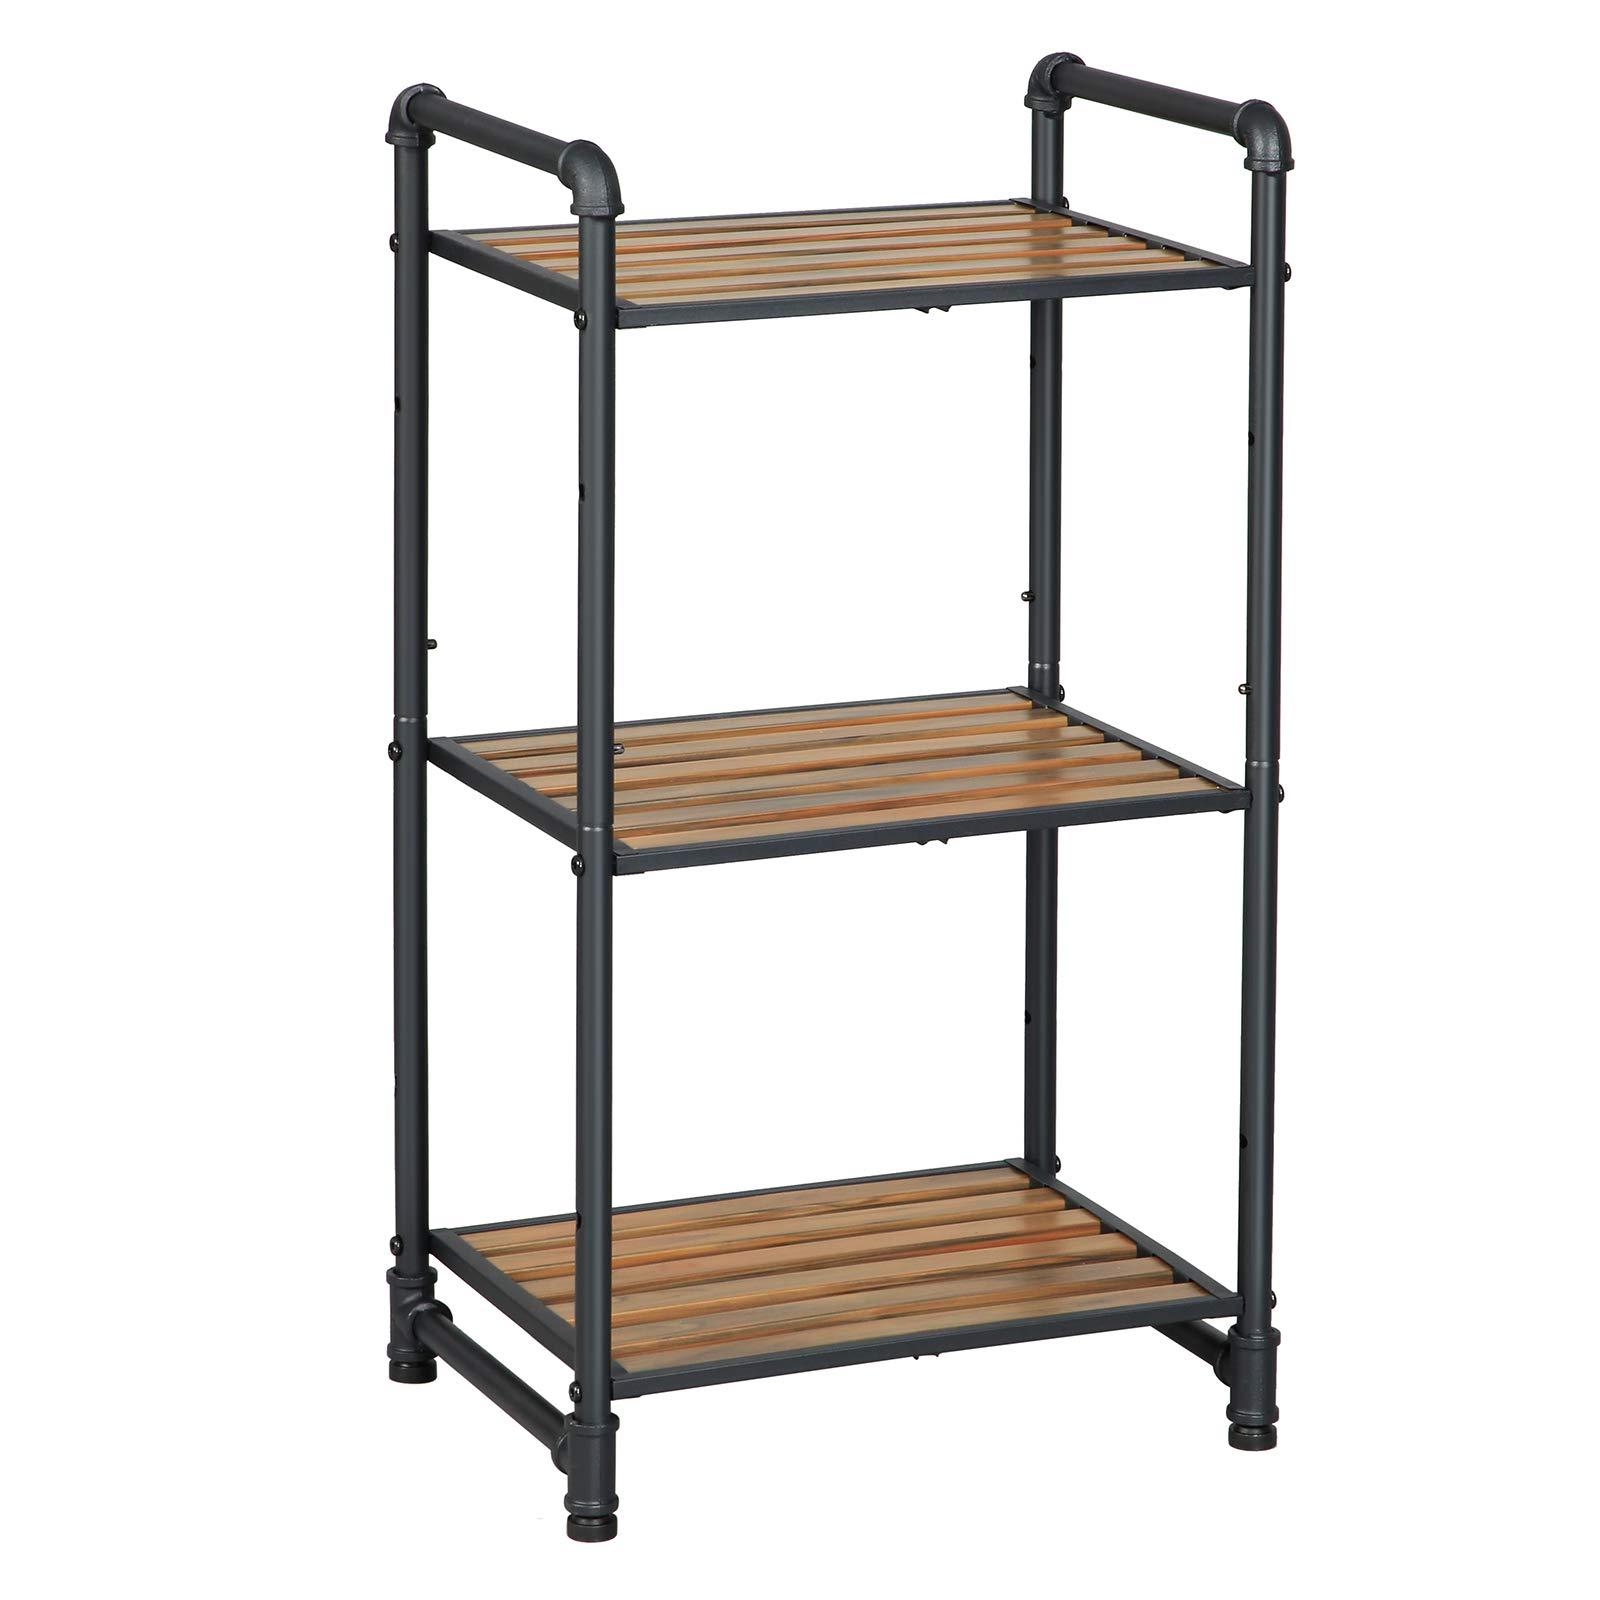 VASAGLE Bathroom Shelf, 3-Tier DIY Storage Rack, Industrial Style Extendable Plant Stand with Adjustable Shelf, for Living Room, Bathroom, Balcony, Kitchen, Rustic Look UBSC23BX